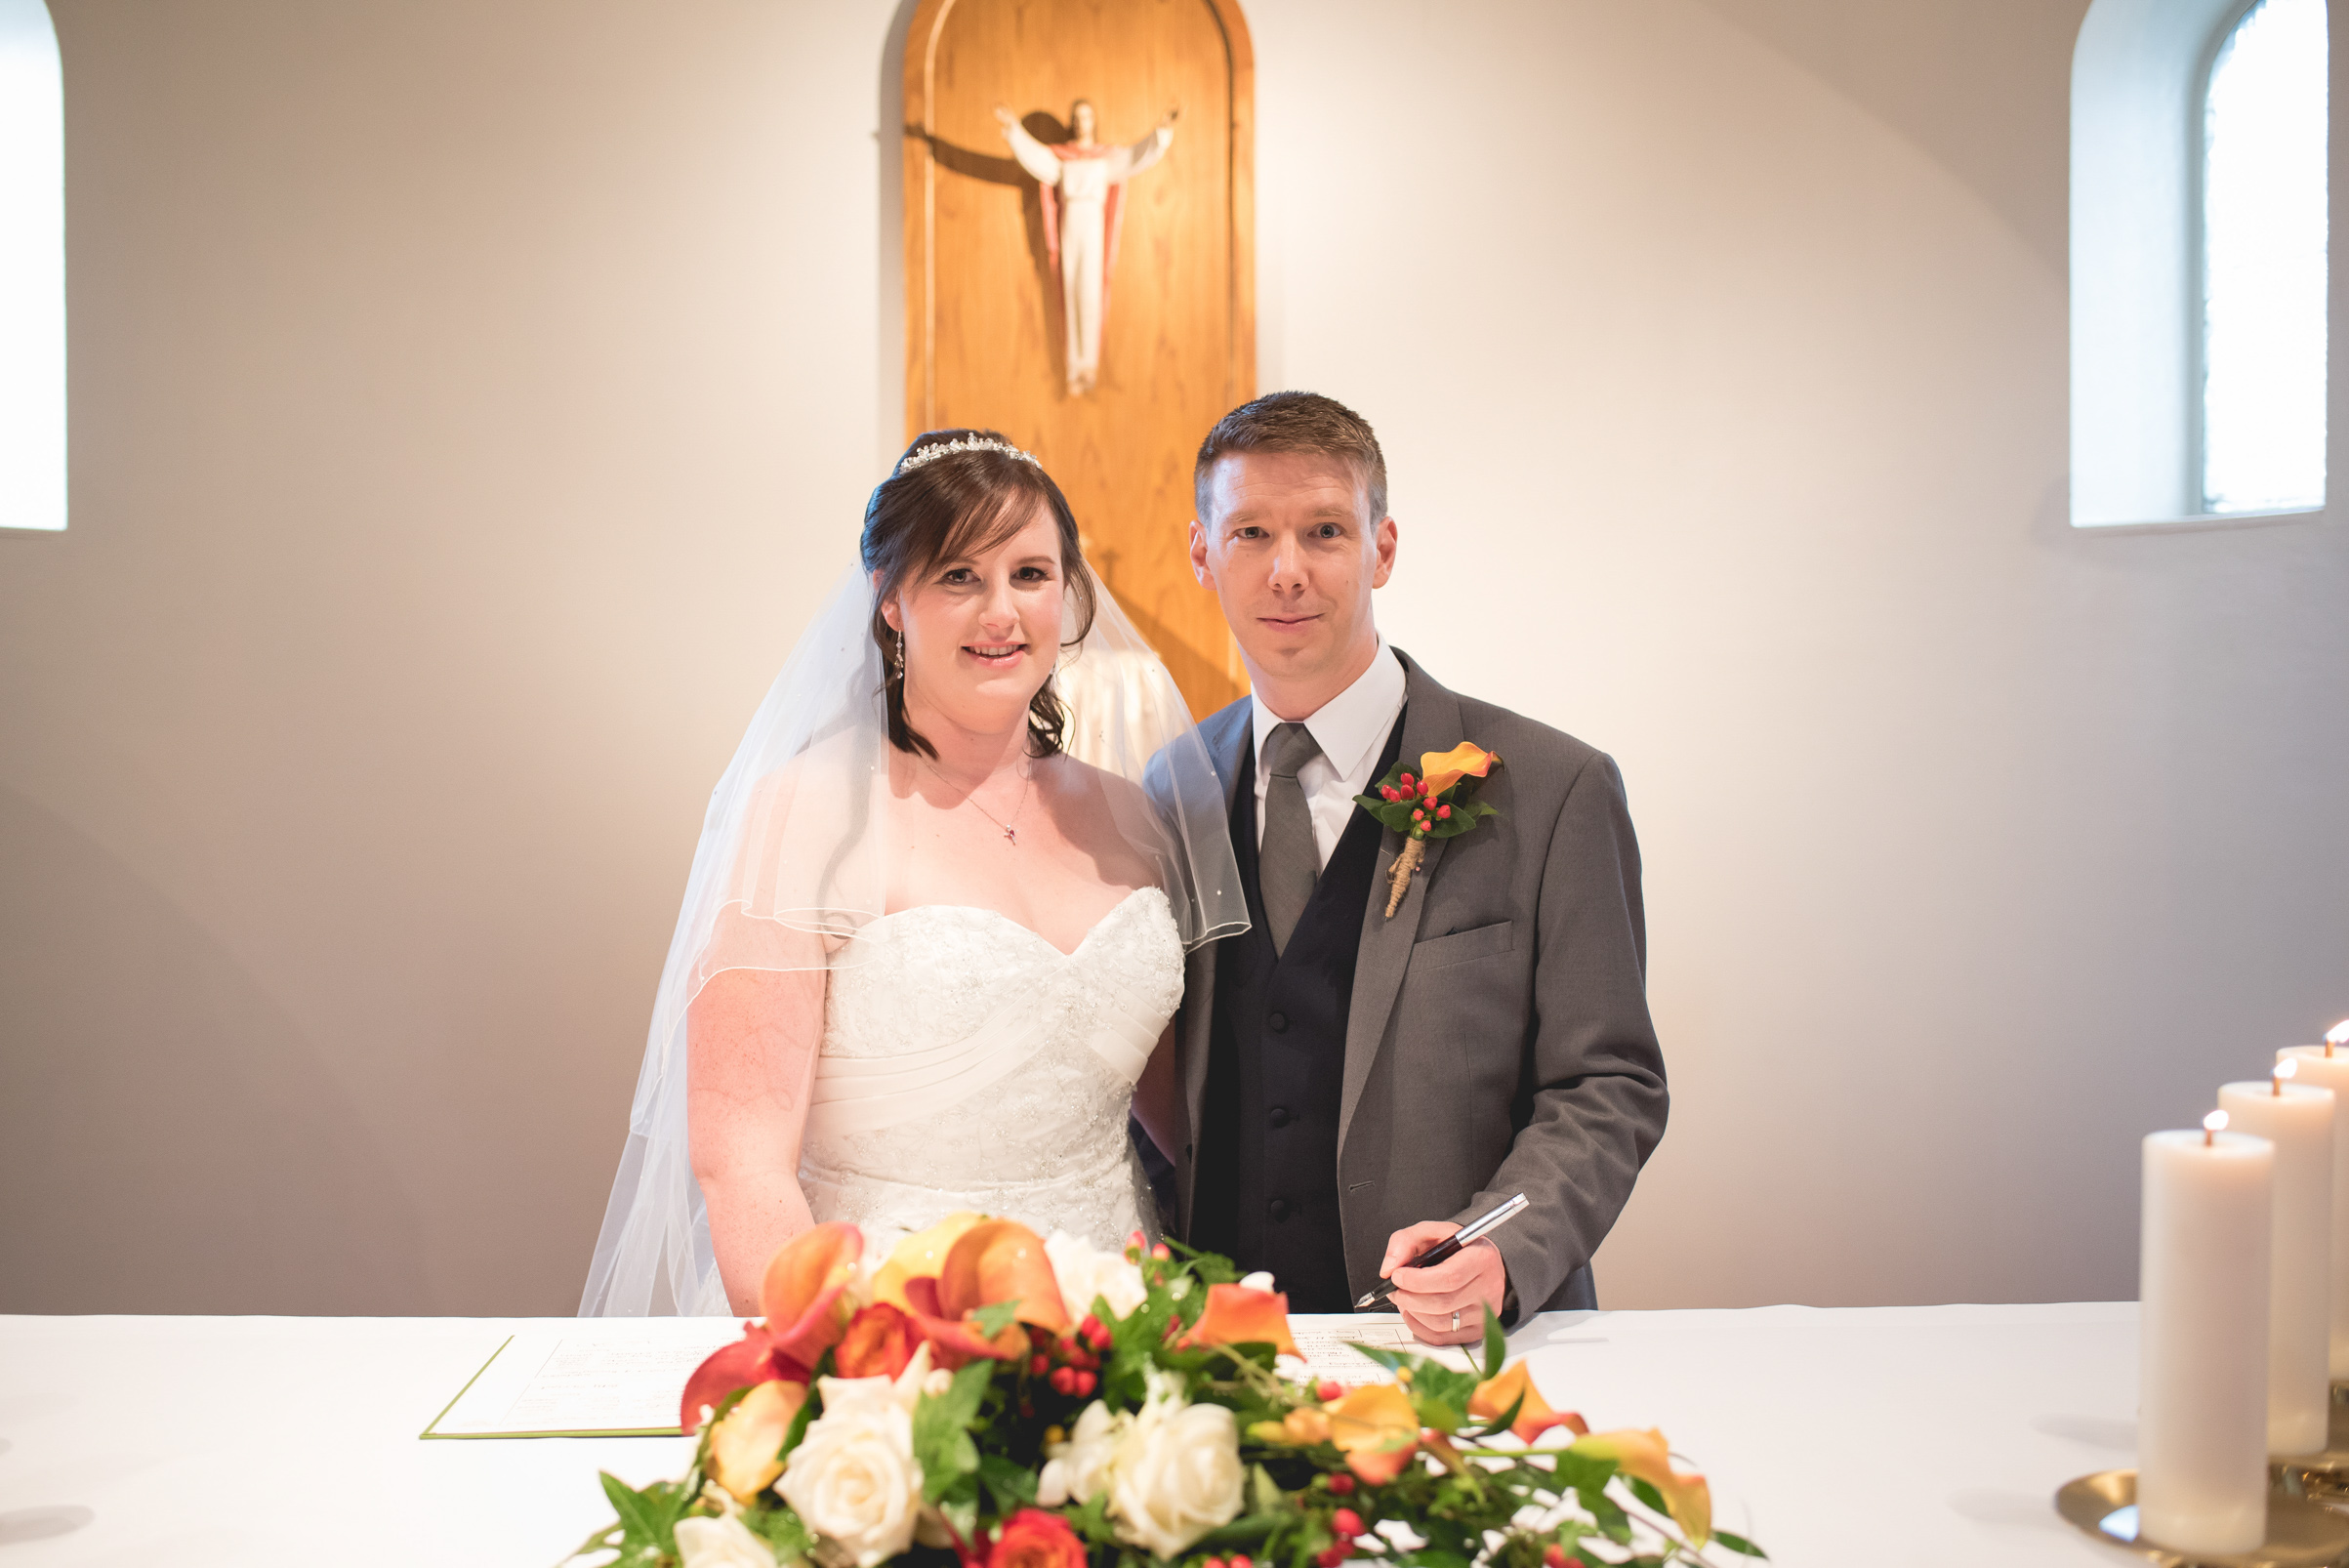 The+Fairlawns+wedding+Aldridge+StLukes+Church-102.jpg